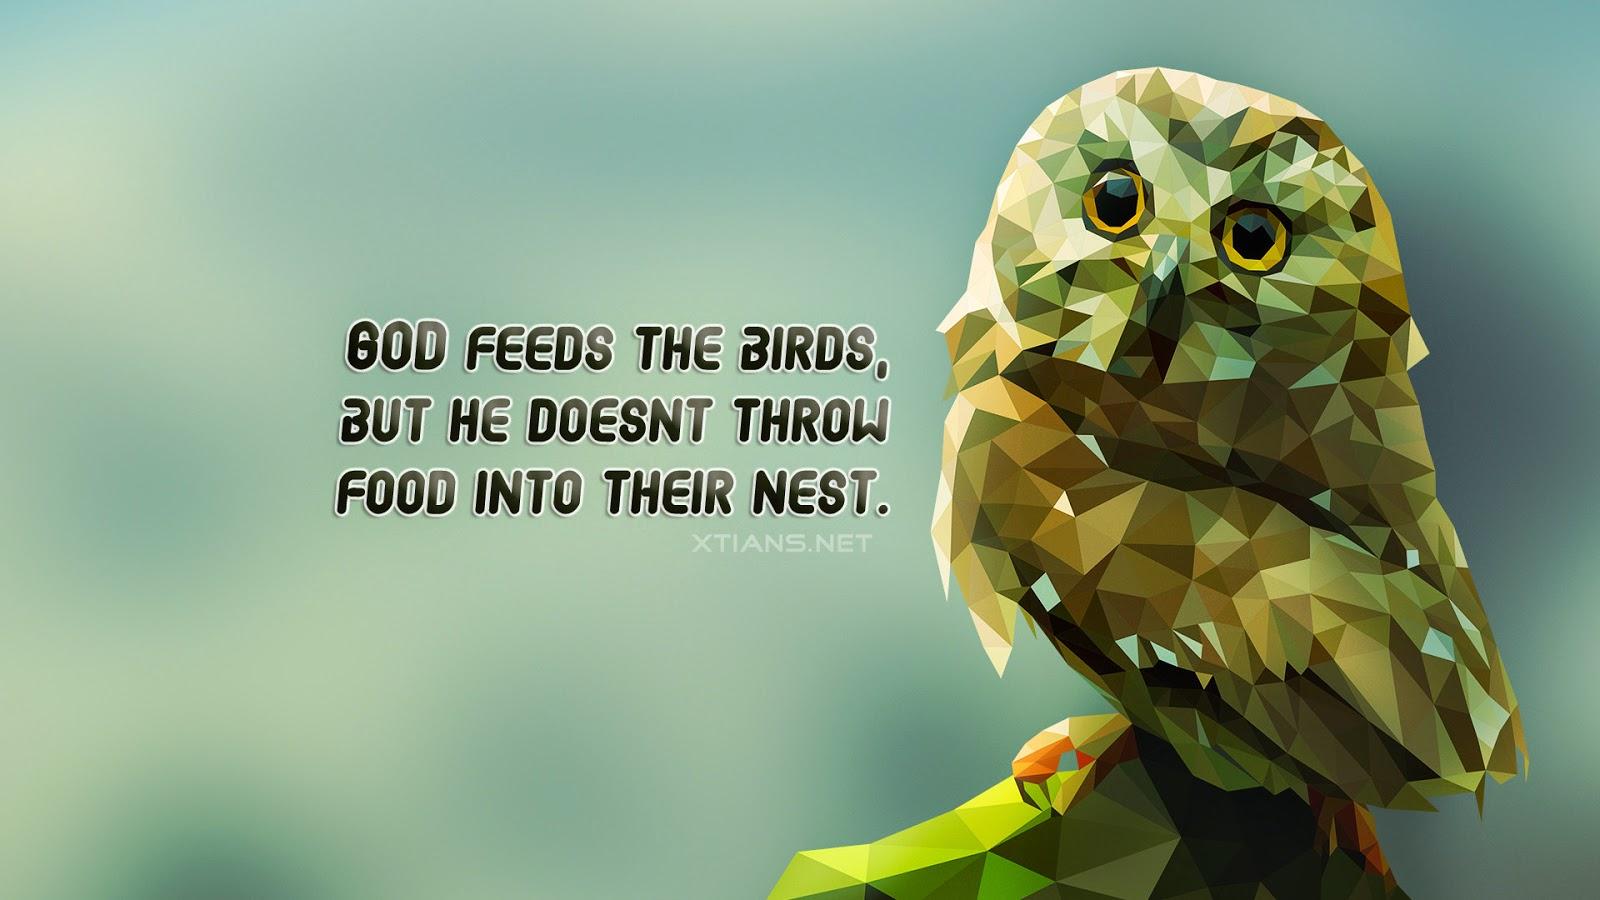 Wallpaper God feeds the birds